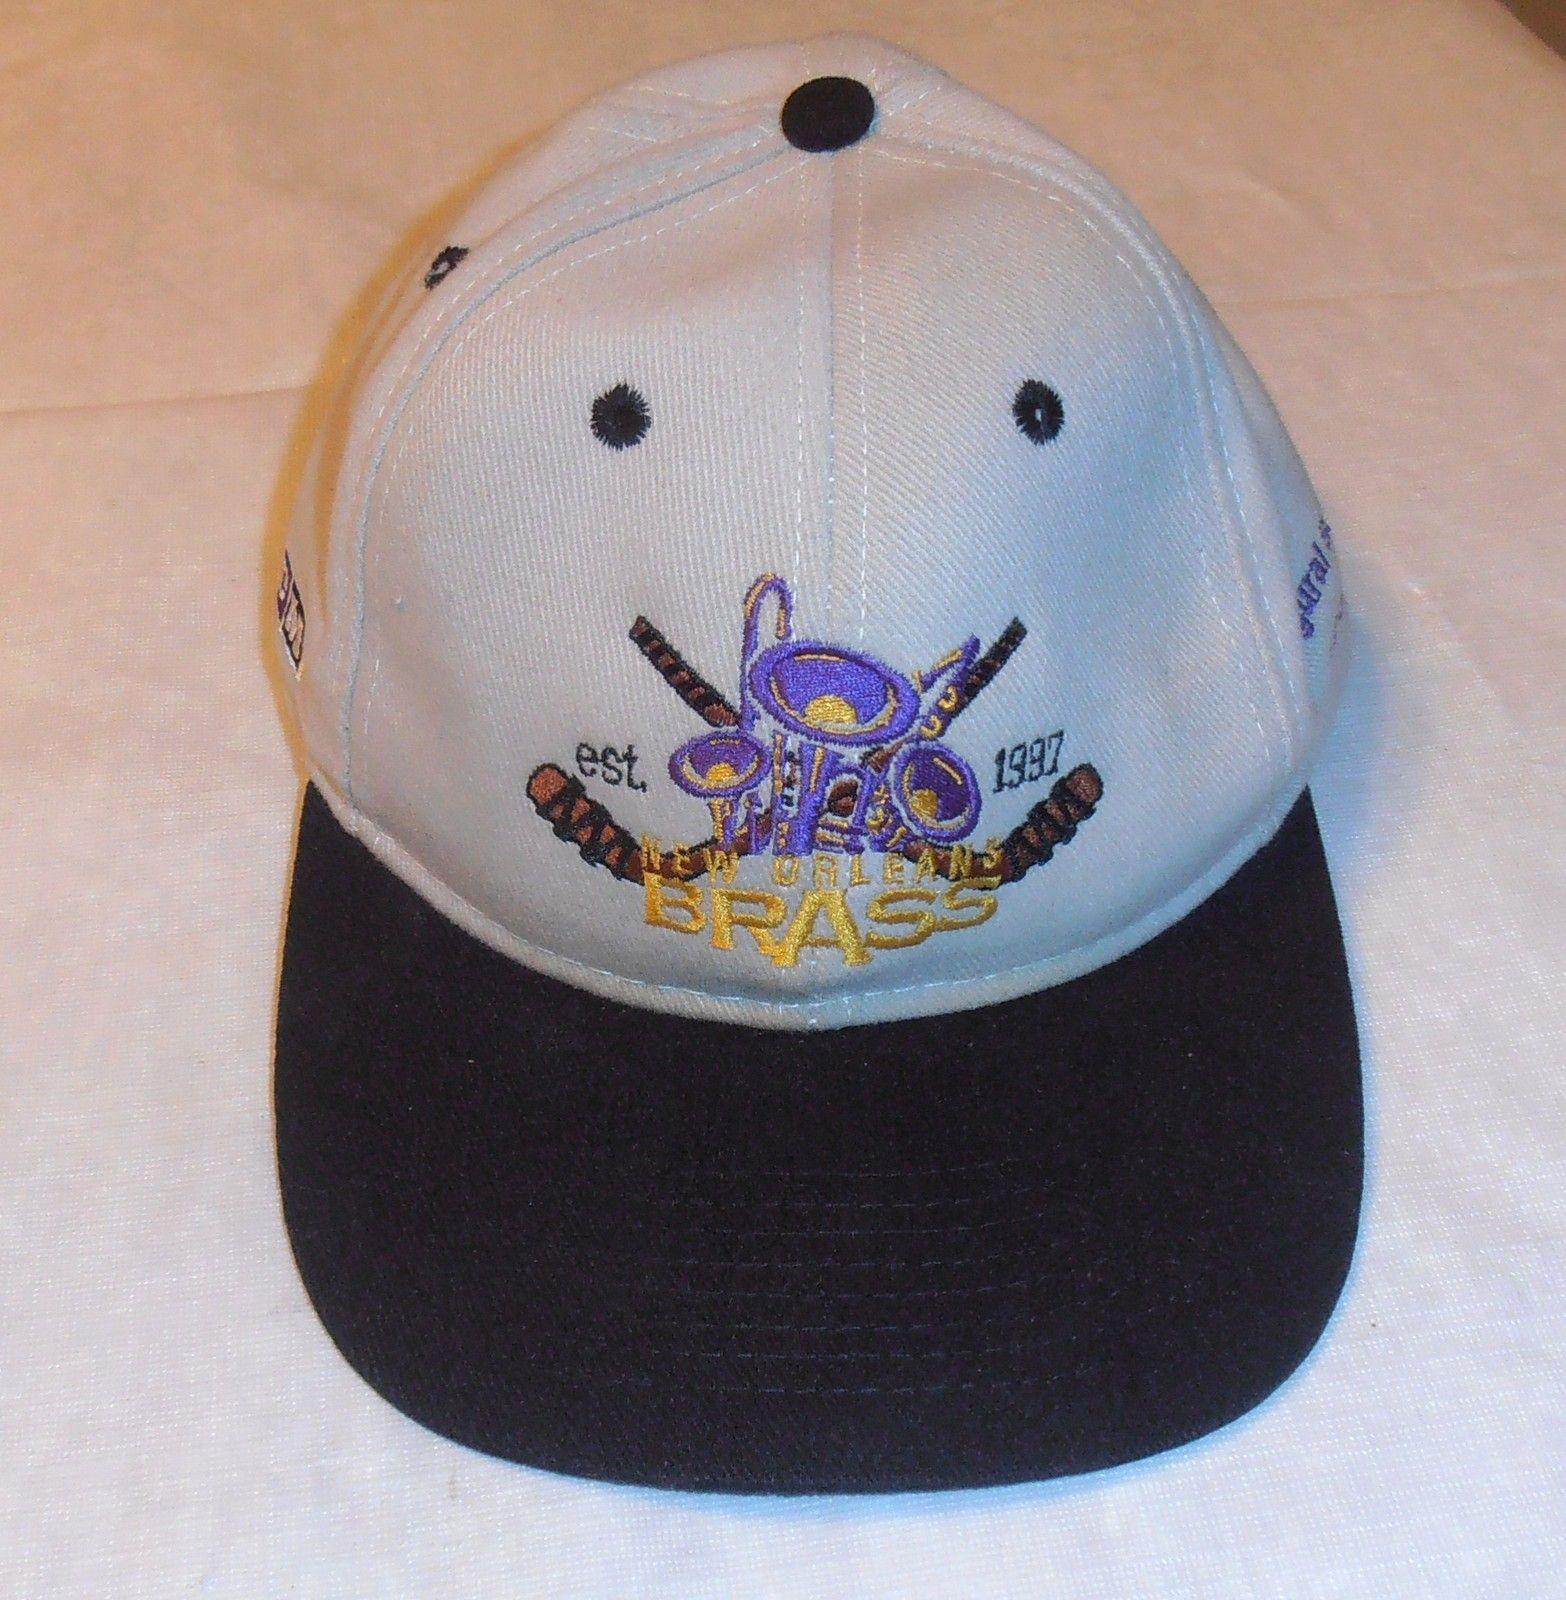 Vintage 1997 98 Inaugural Season New Orleans Brass Hockey Cap Hat   eBay